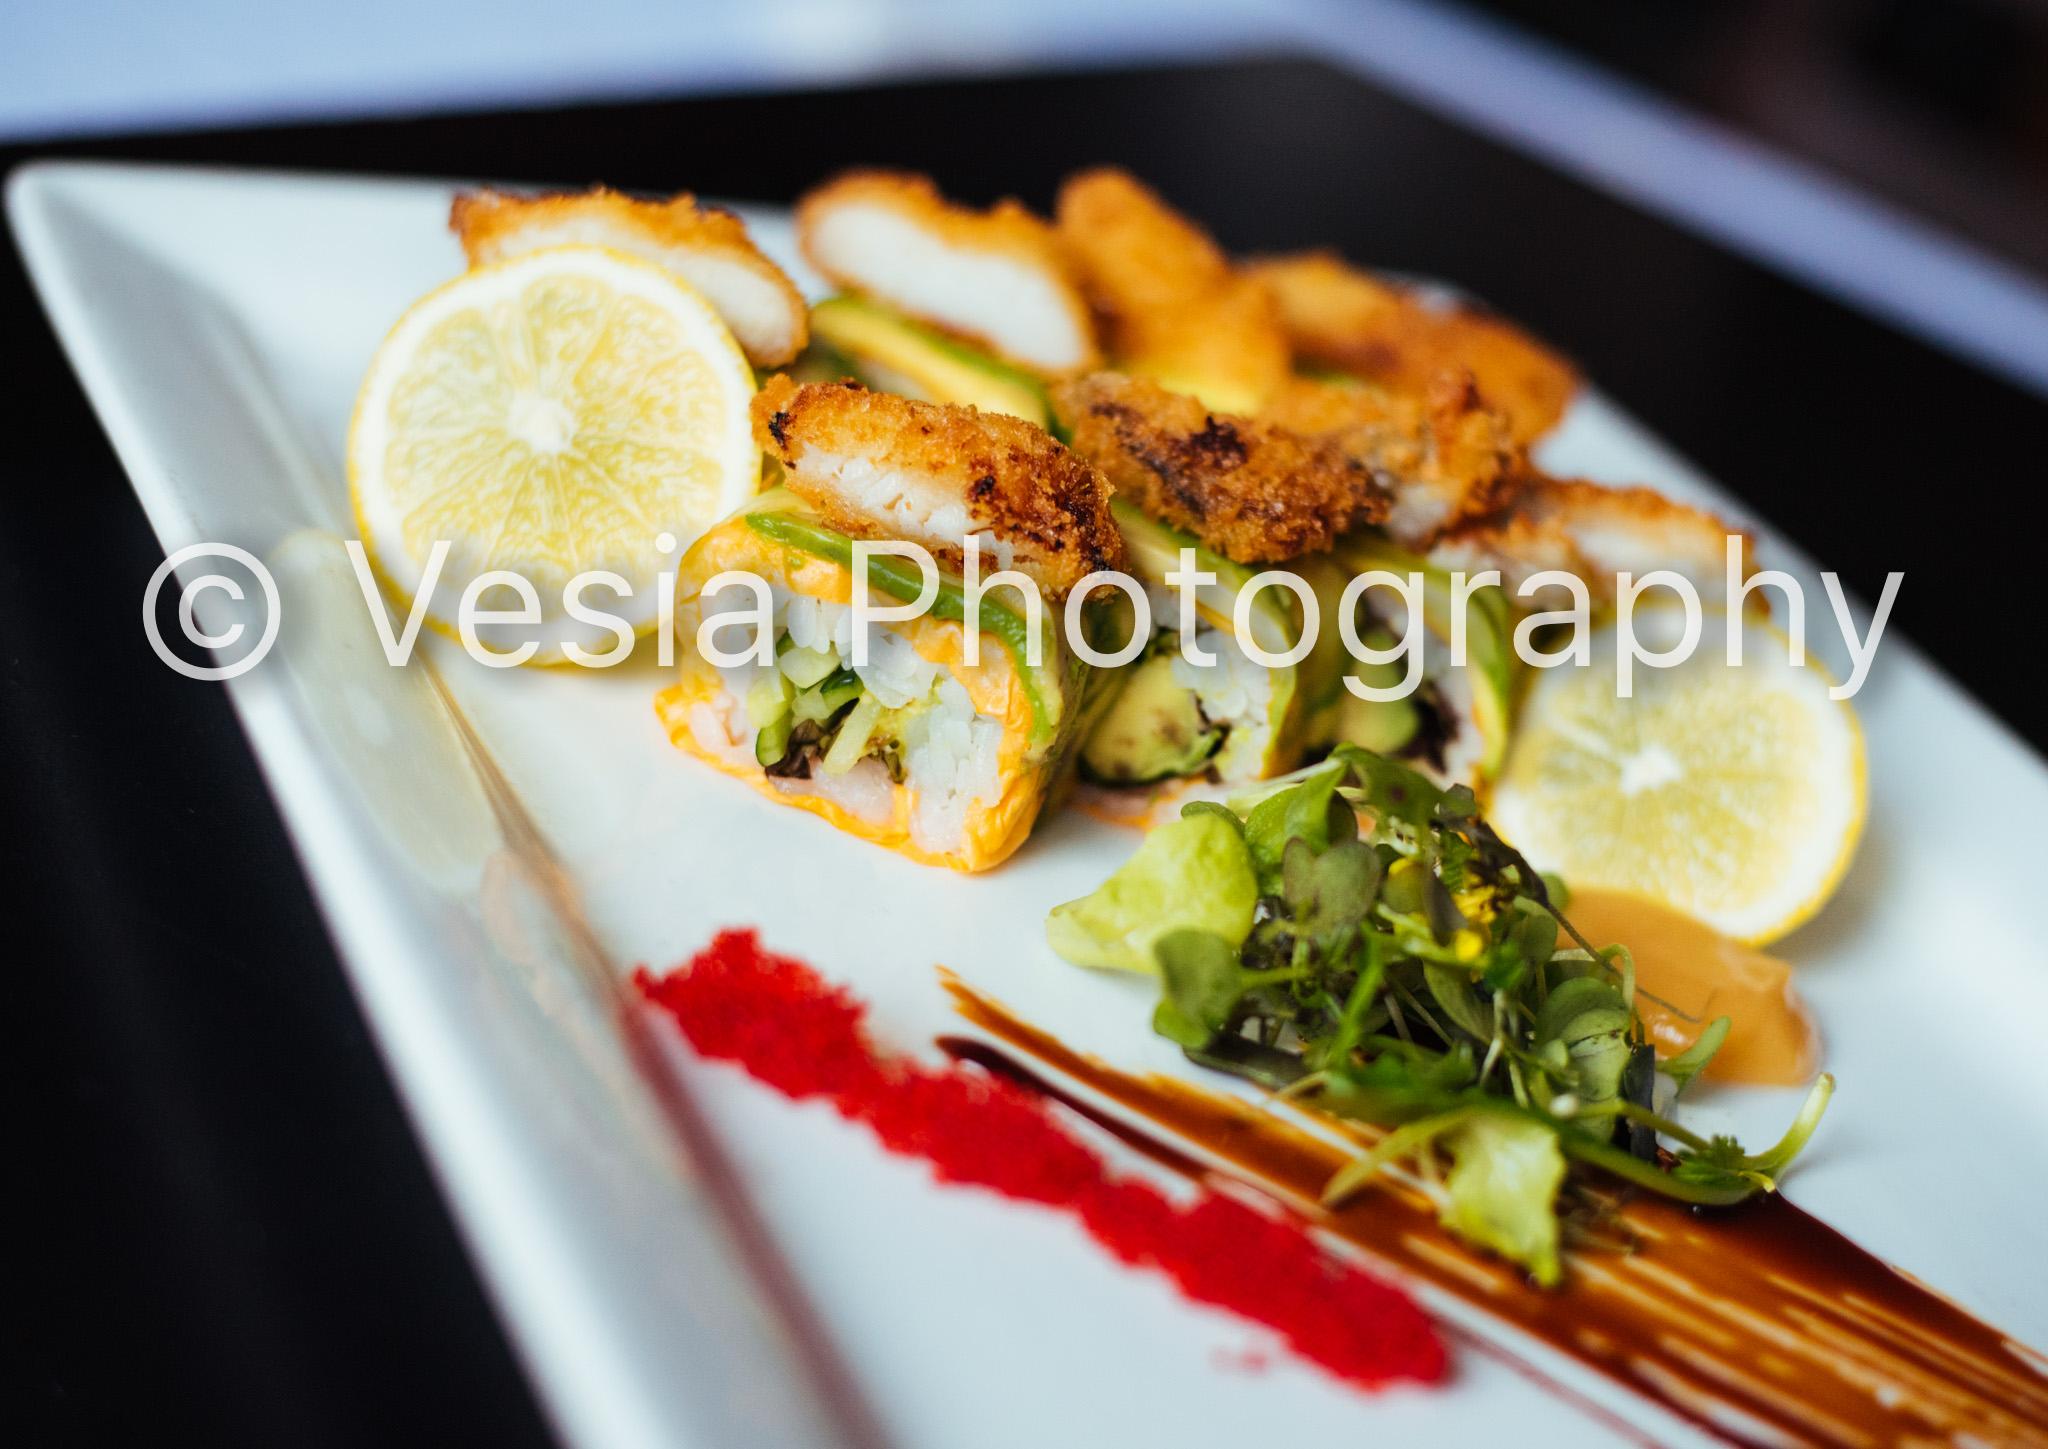 Caviar_Sushi_Proofs-20.jpg